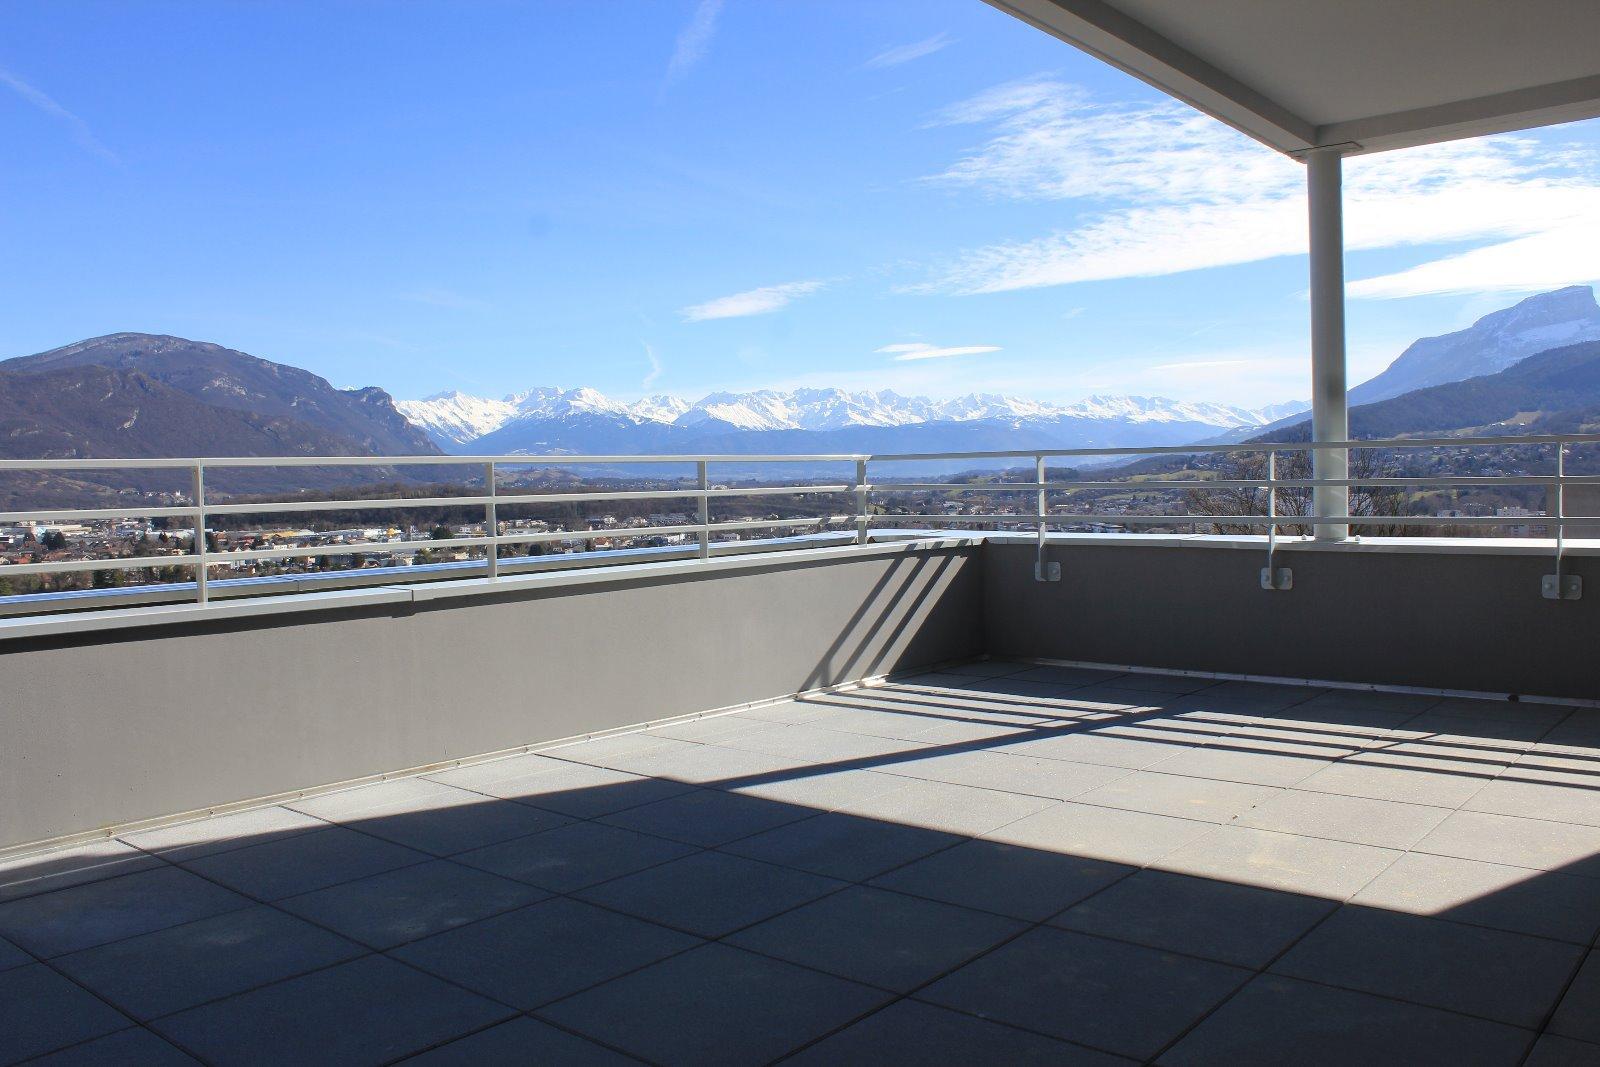 Bassens, Appartement T4 de Standing 122m² avec vue imprenable